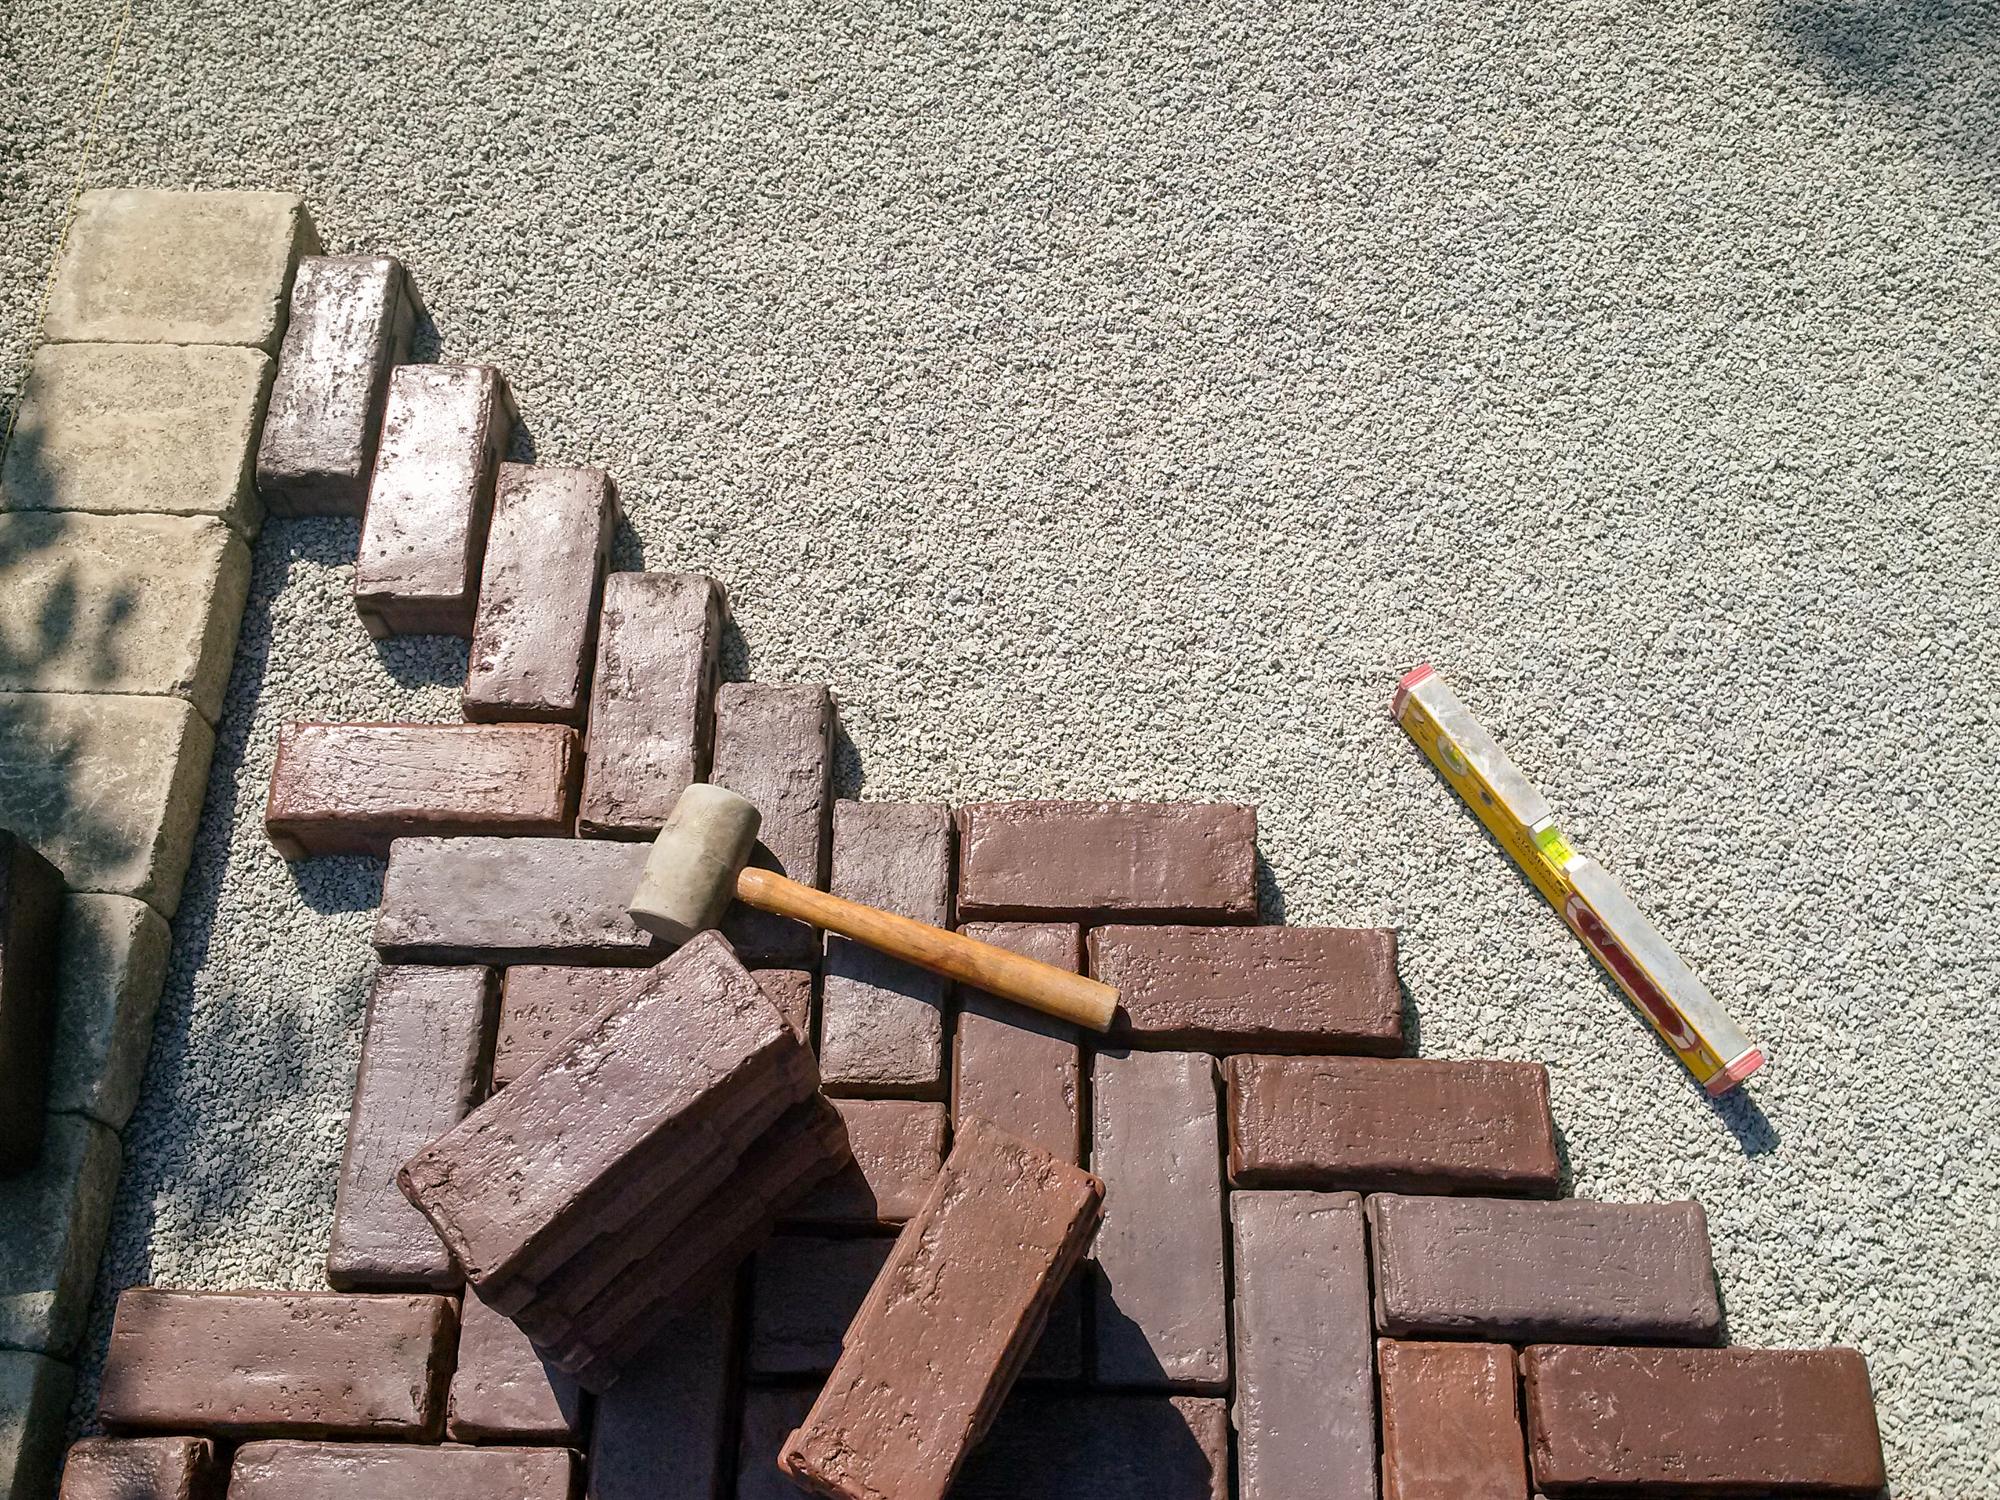 Harringbone design progress